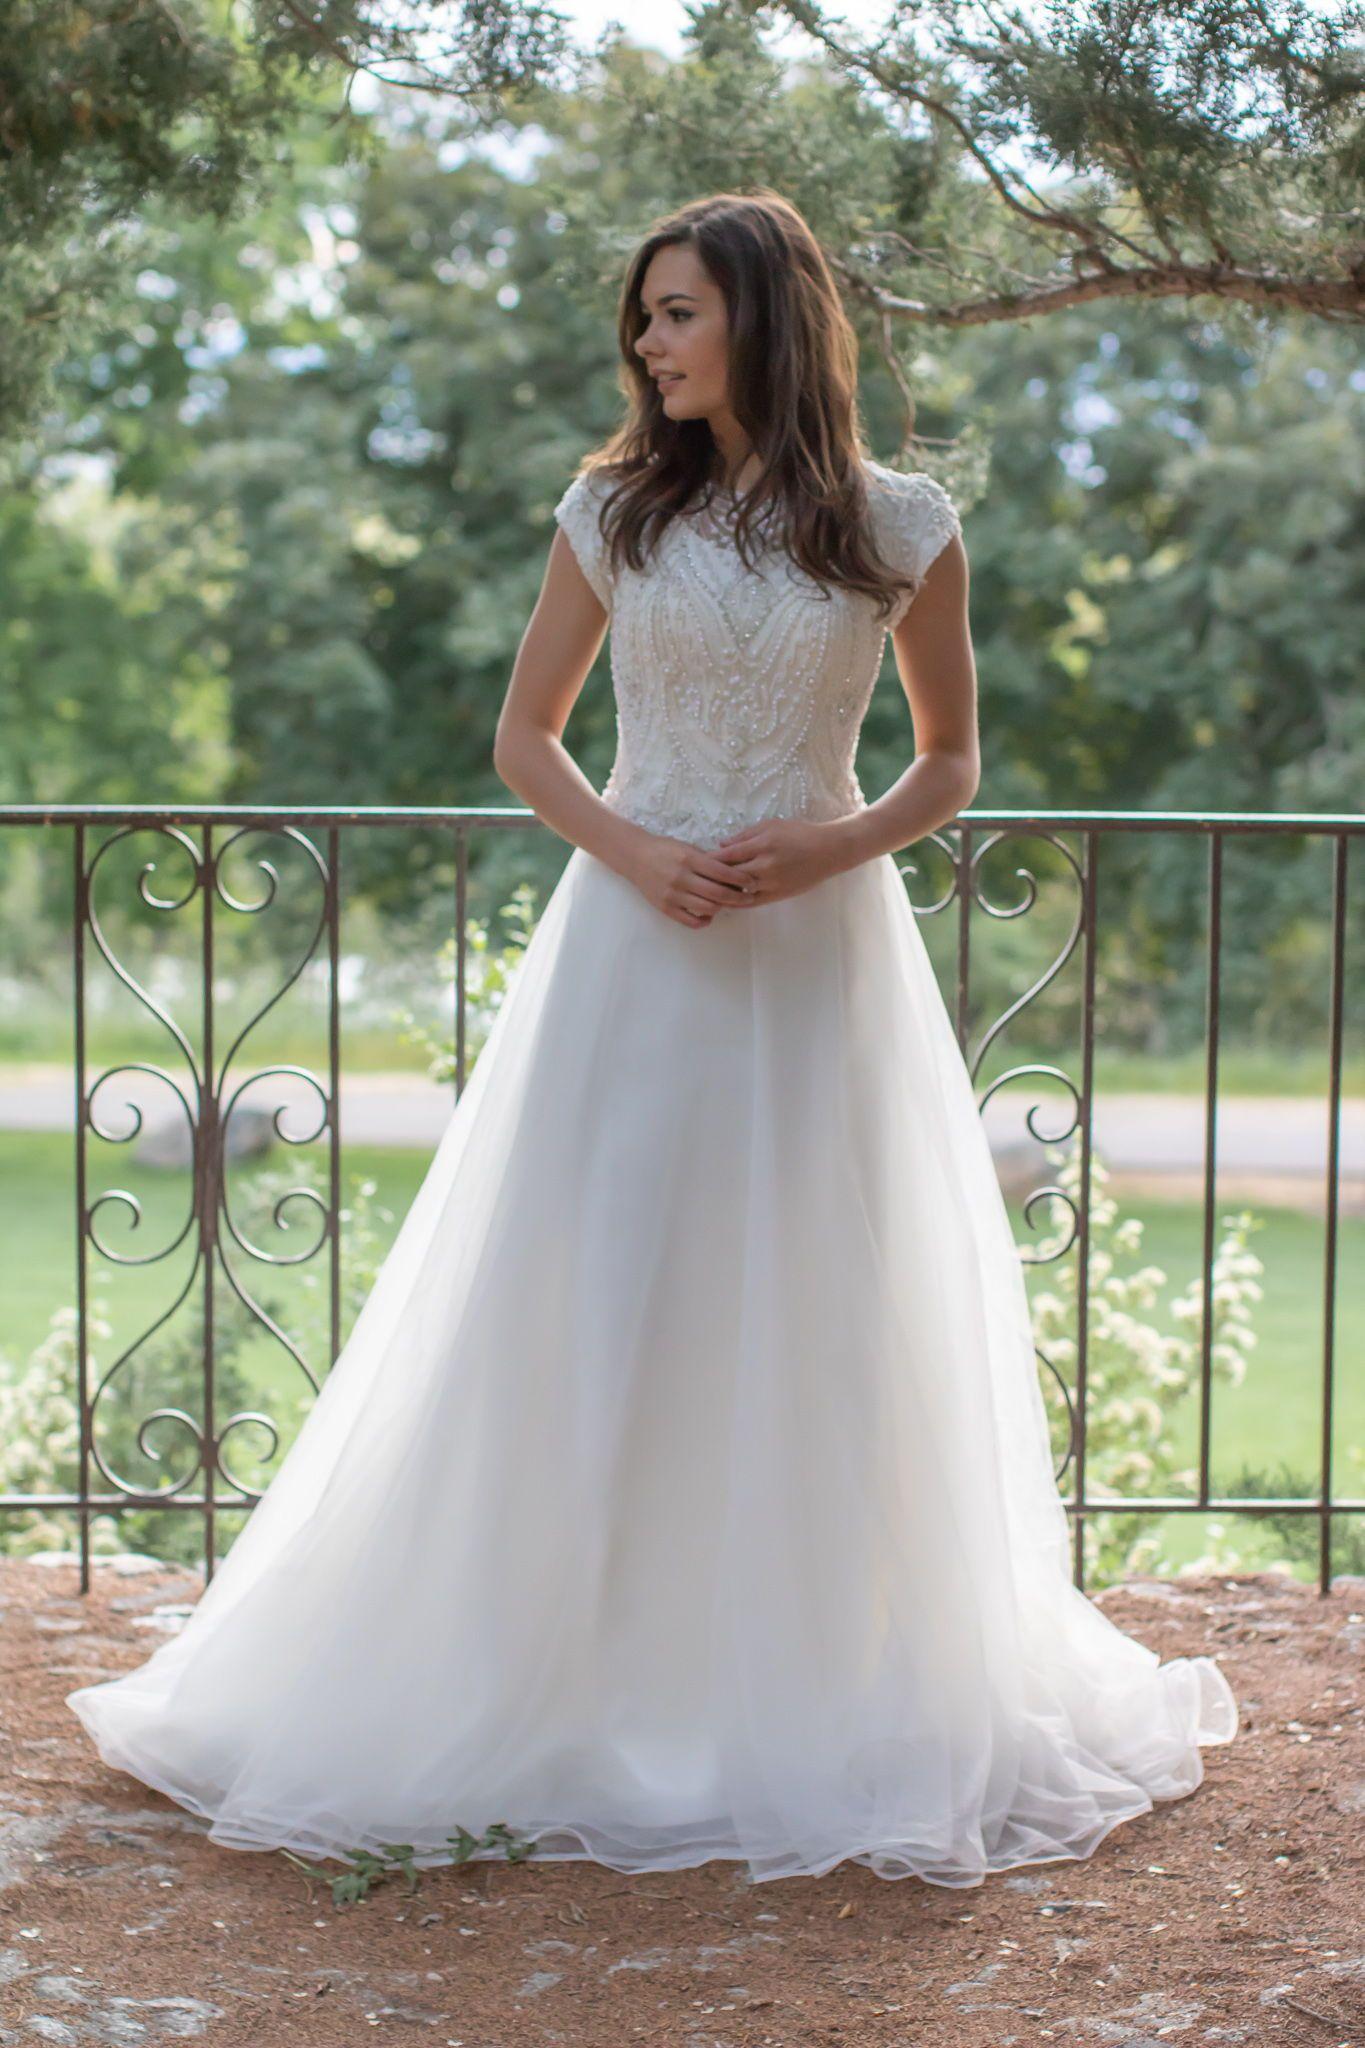 Wedding Dresses Utah.Unique Modest Wedding Dresses Utah Lixnet Ag